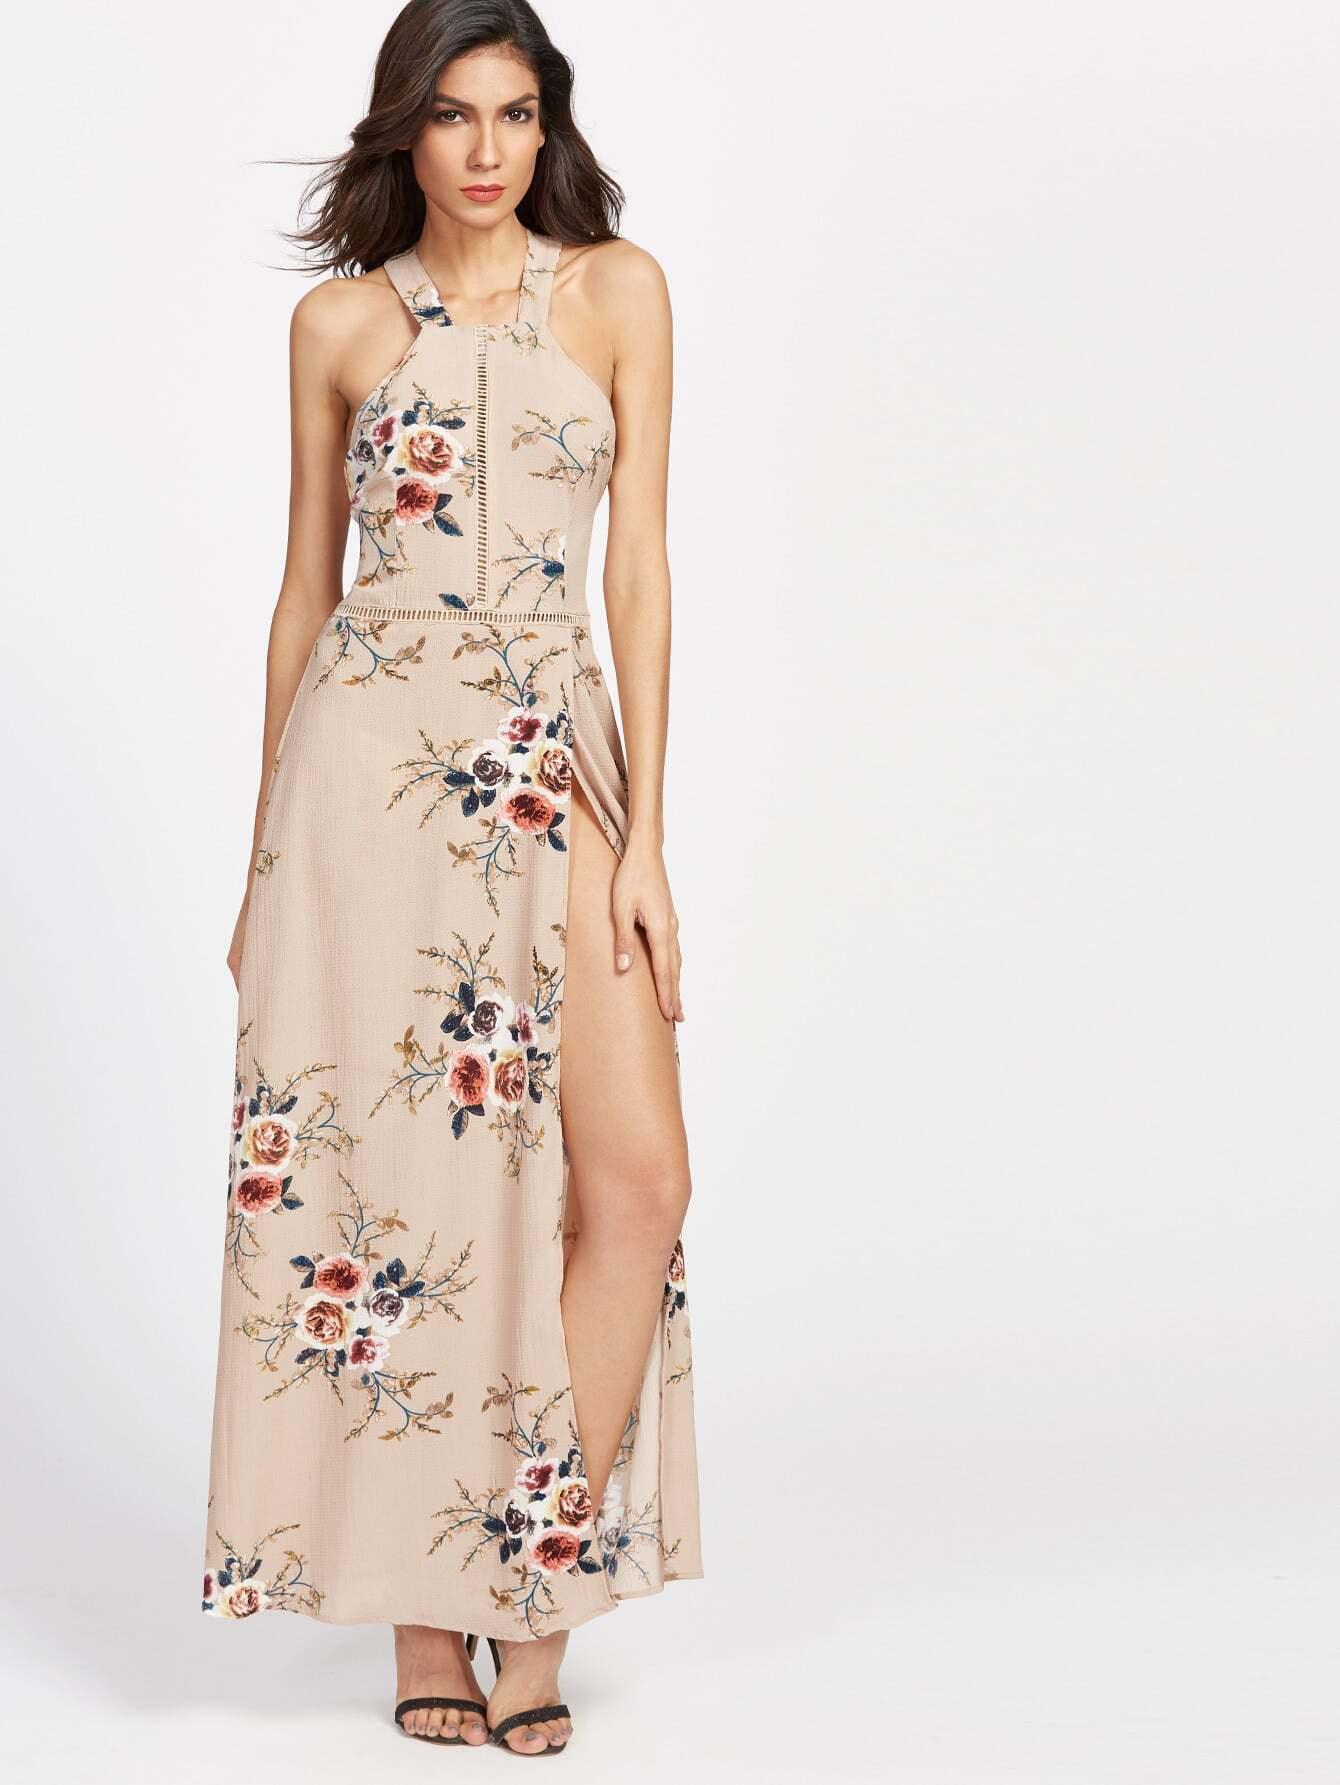 Khaki Florals Halter Open Back High Slit Dress dress170314314